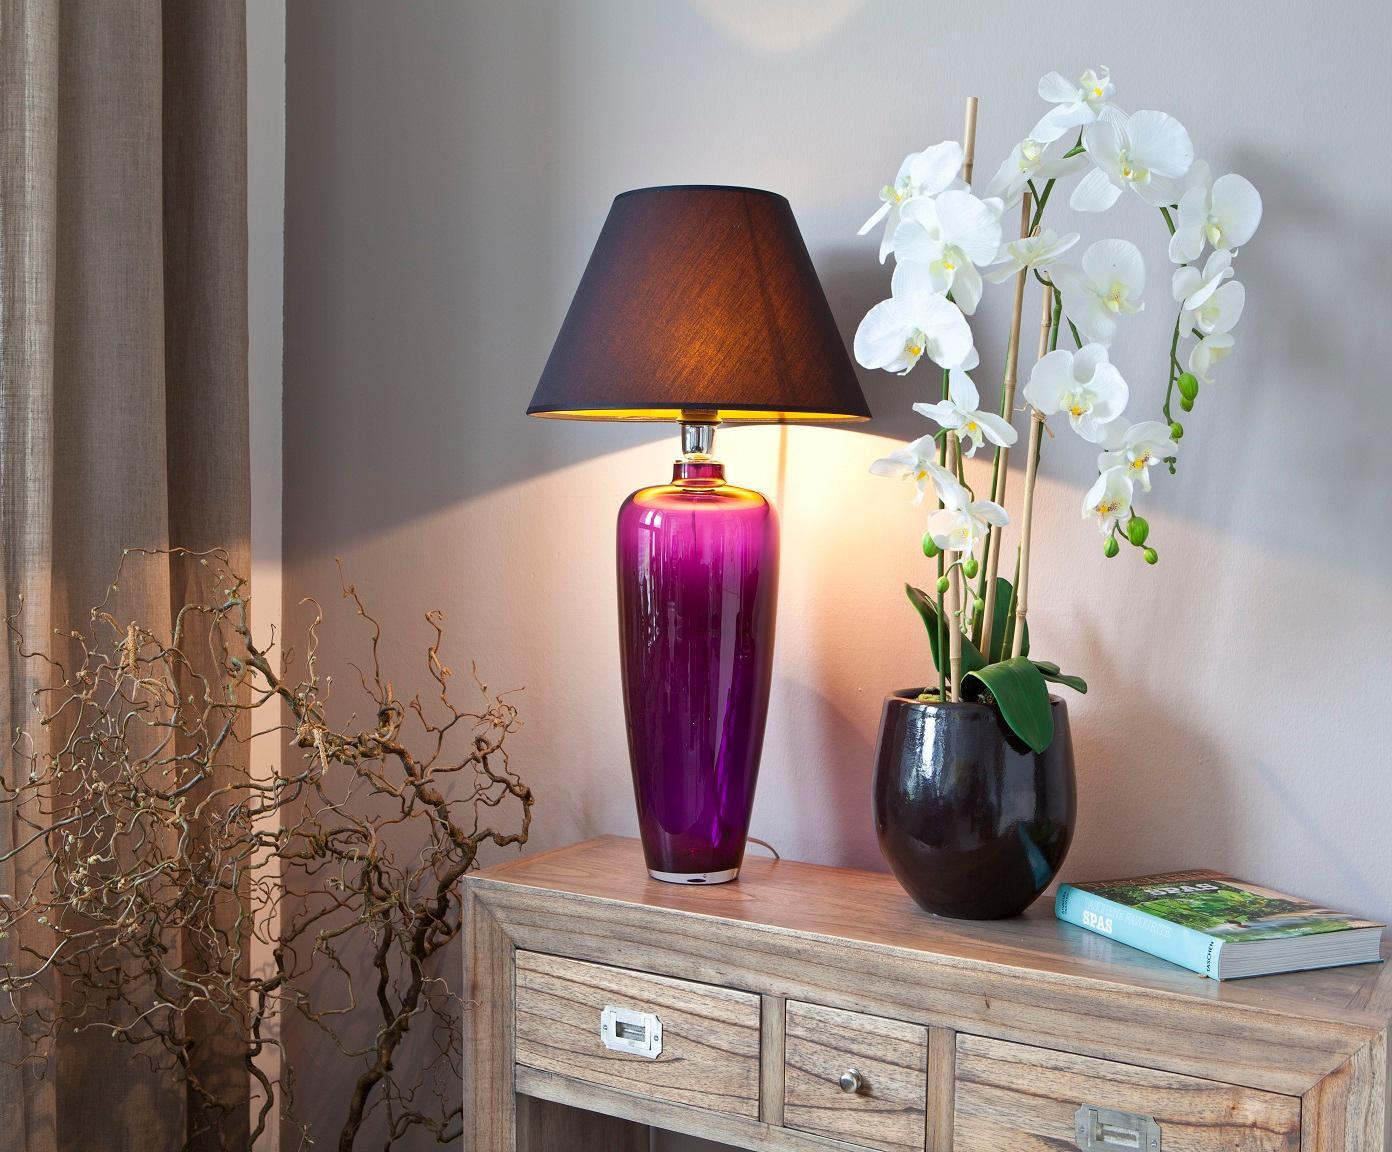 Full Size of Wohnzimmer Tischlampe Modern Lampe Ikea Led Ebay Designer Tischlampen Holz Glaslampe In Strahlendem Violett Als Eyecatcher Woh Großes Bild Hängeschrank Wohnzimmer Wohnzimmer Tischlampe